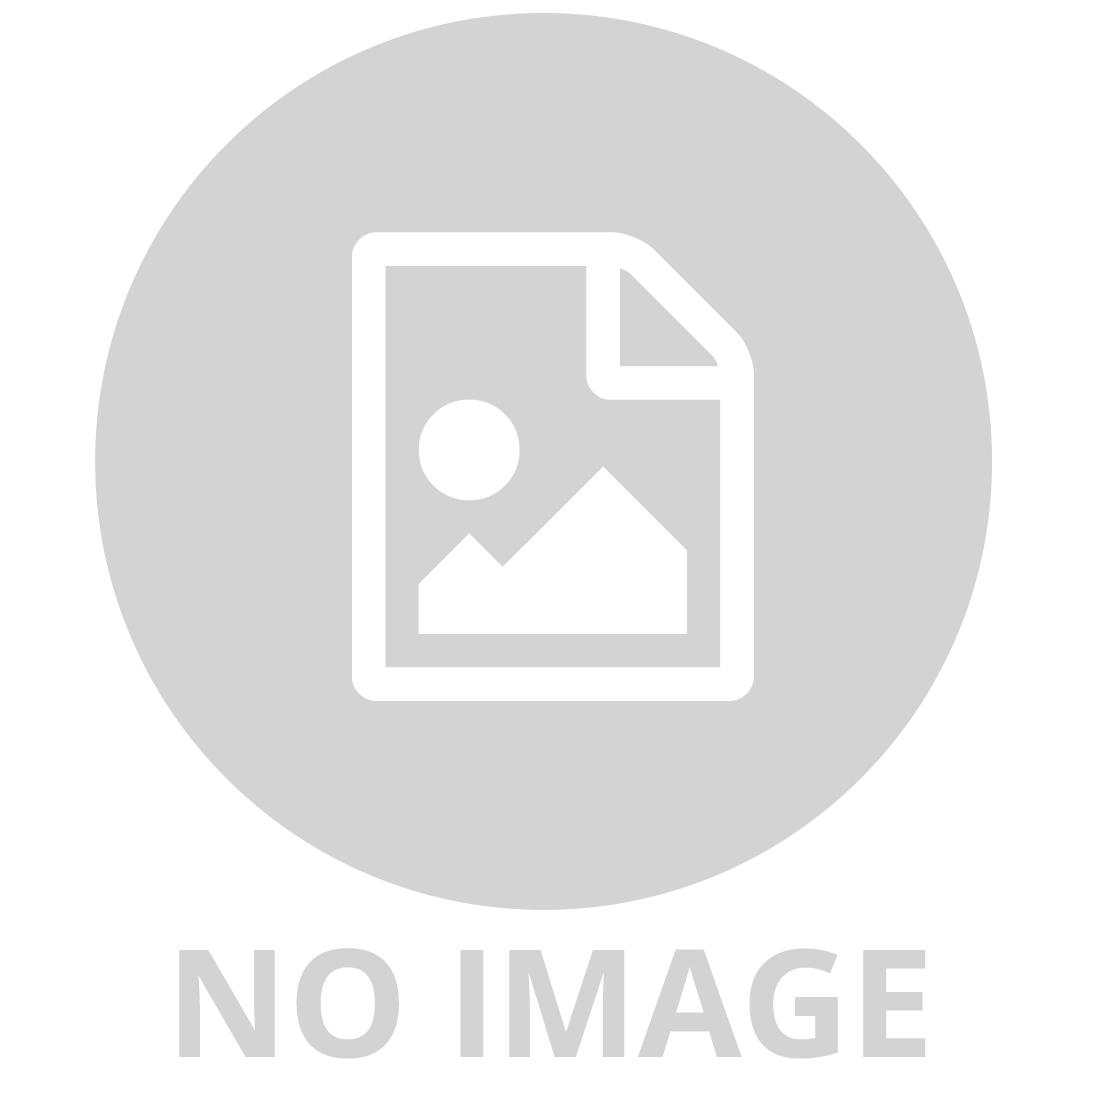 TIKK TOKK BOSS WOODEN TABLE AND CHAIRS